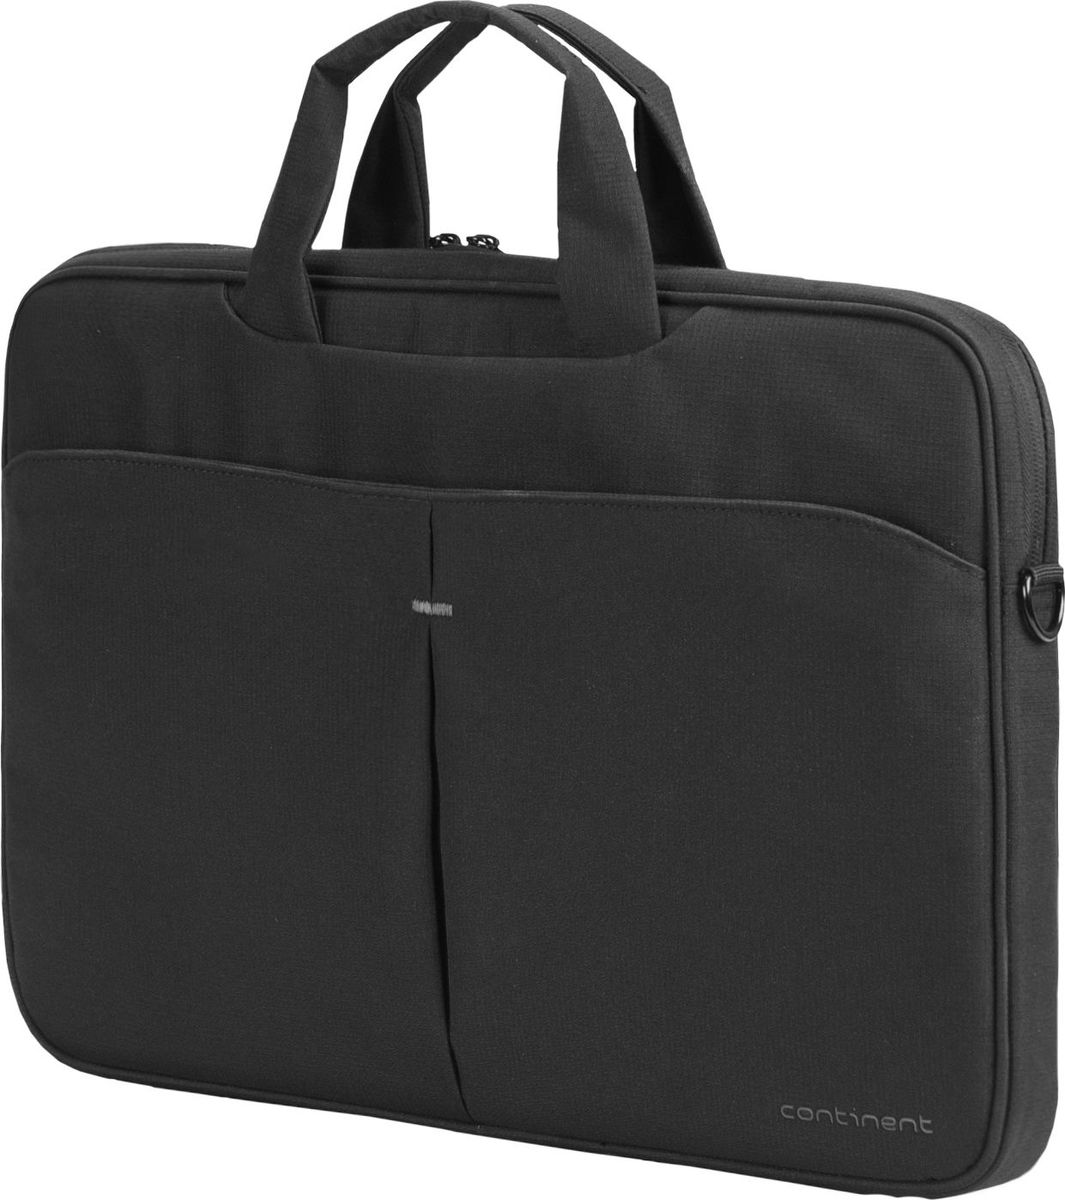 "Continent CC-012, Black сумка для ноутбука 15,6"""